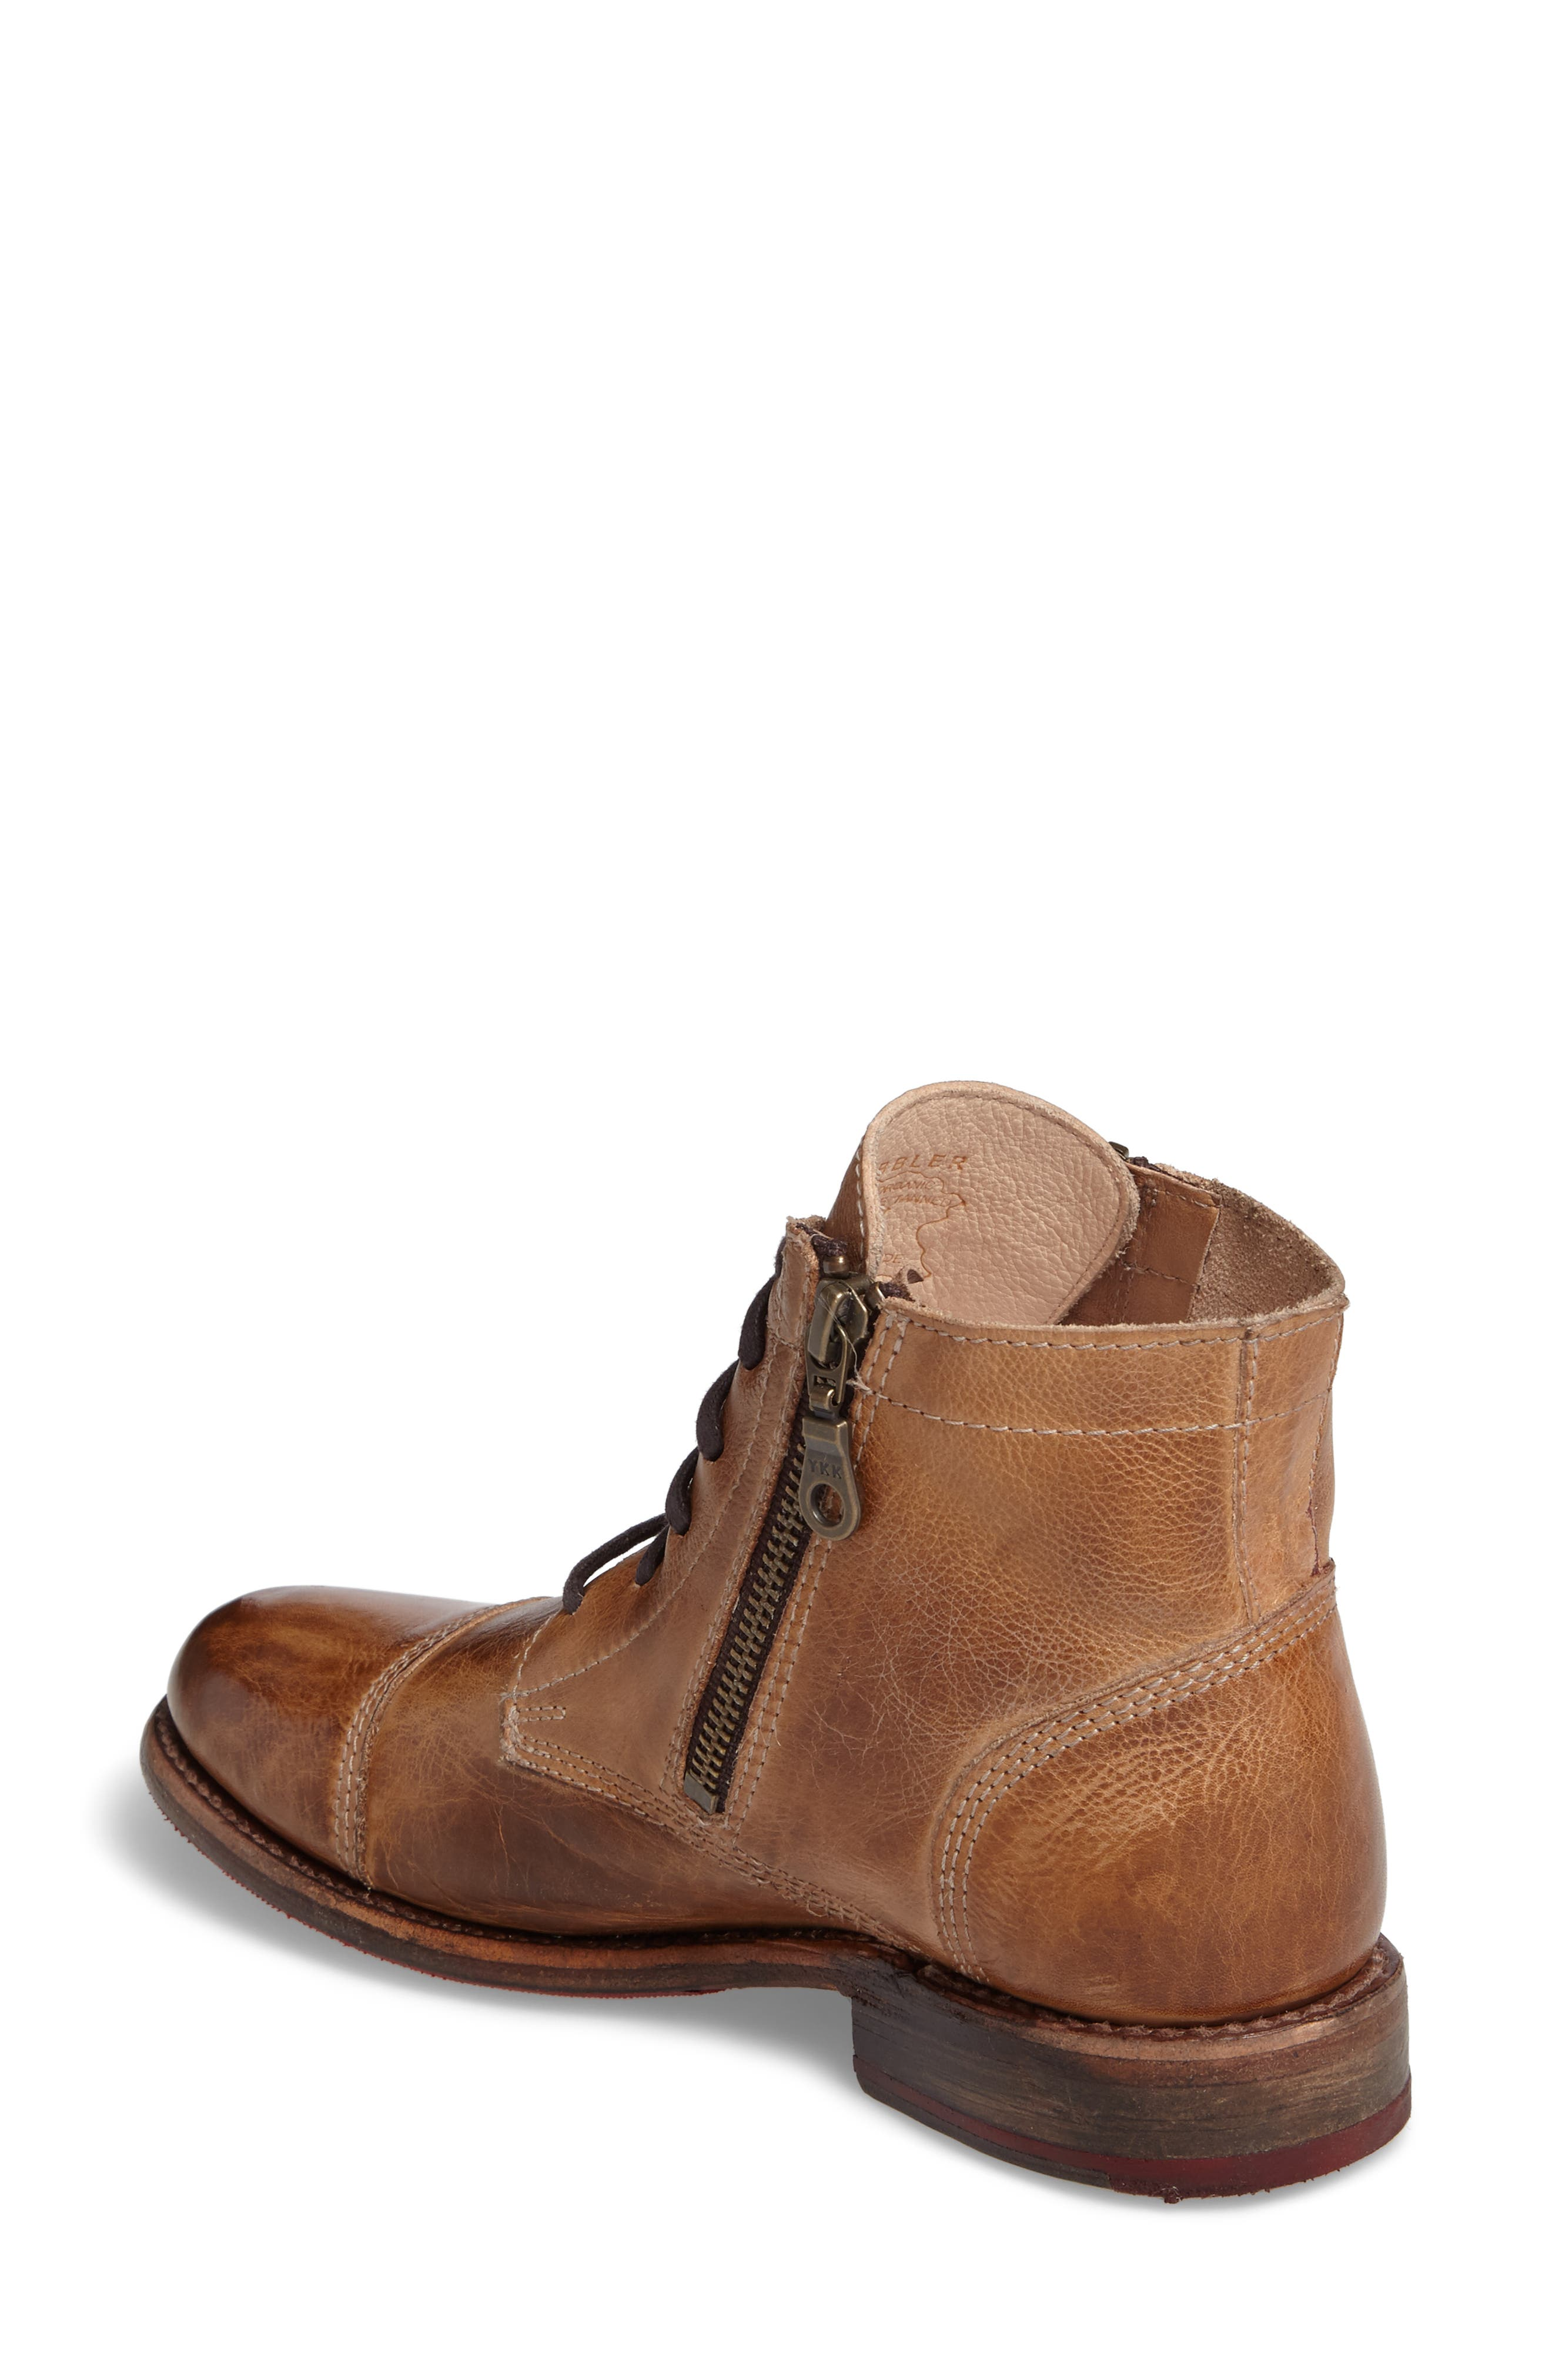 'Bonnie' Boot,                             Alternate thumbnail 2, color,                             Tan Rustic Leather